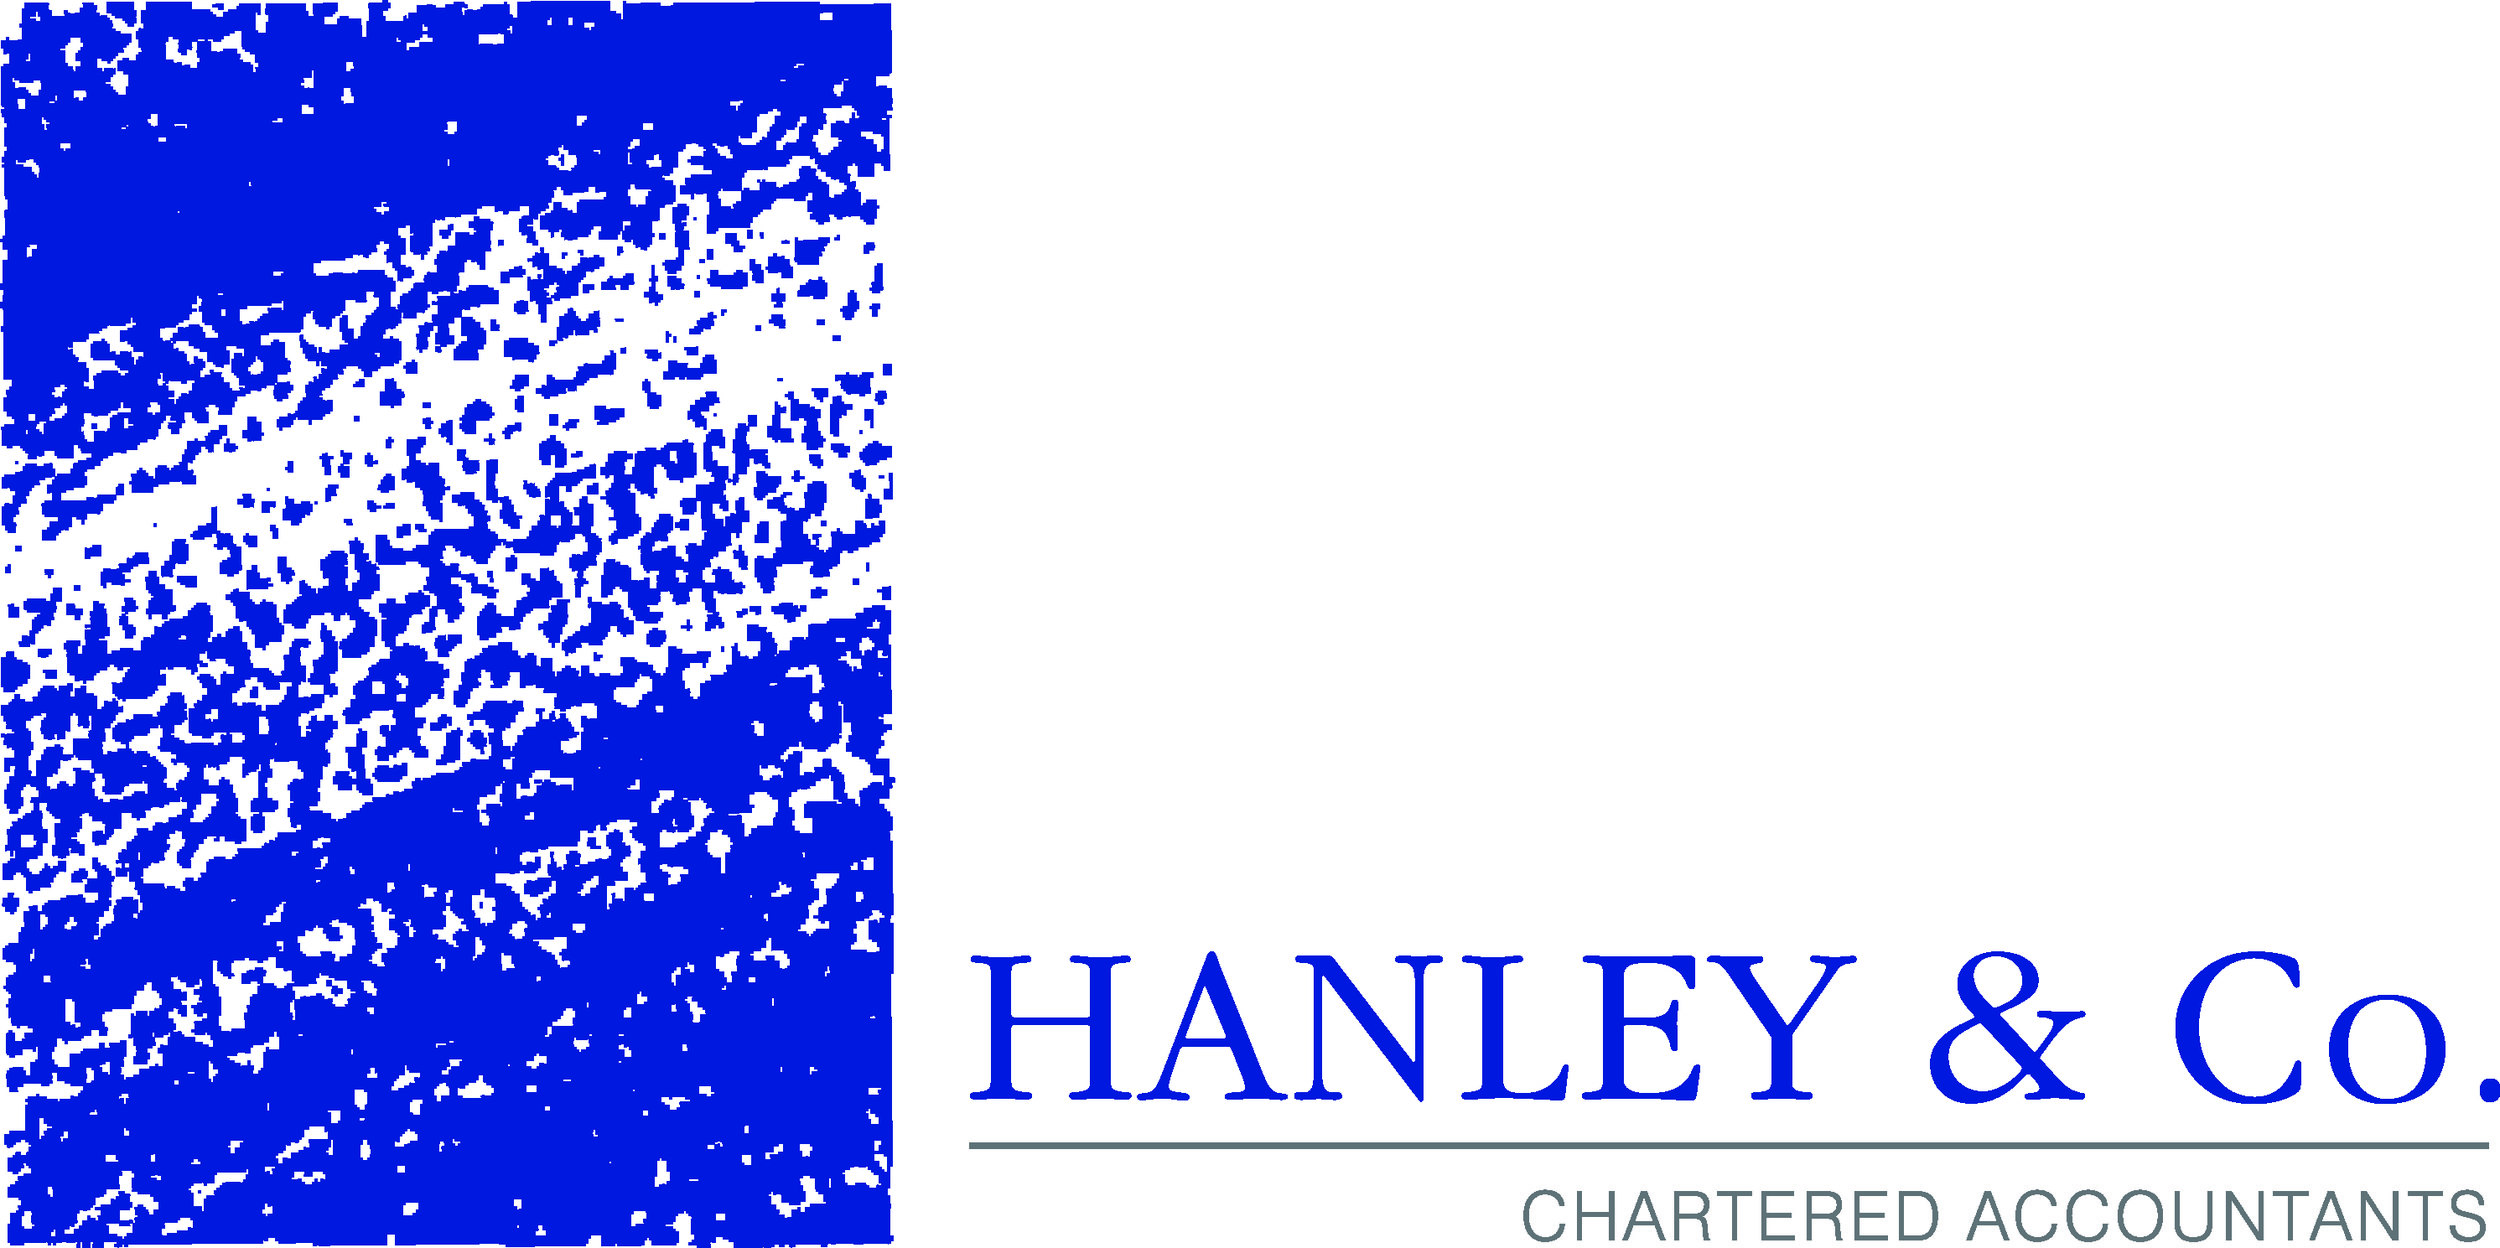 Hanley & Co logo.jpg